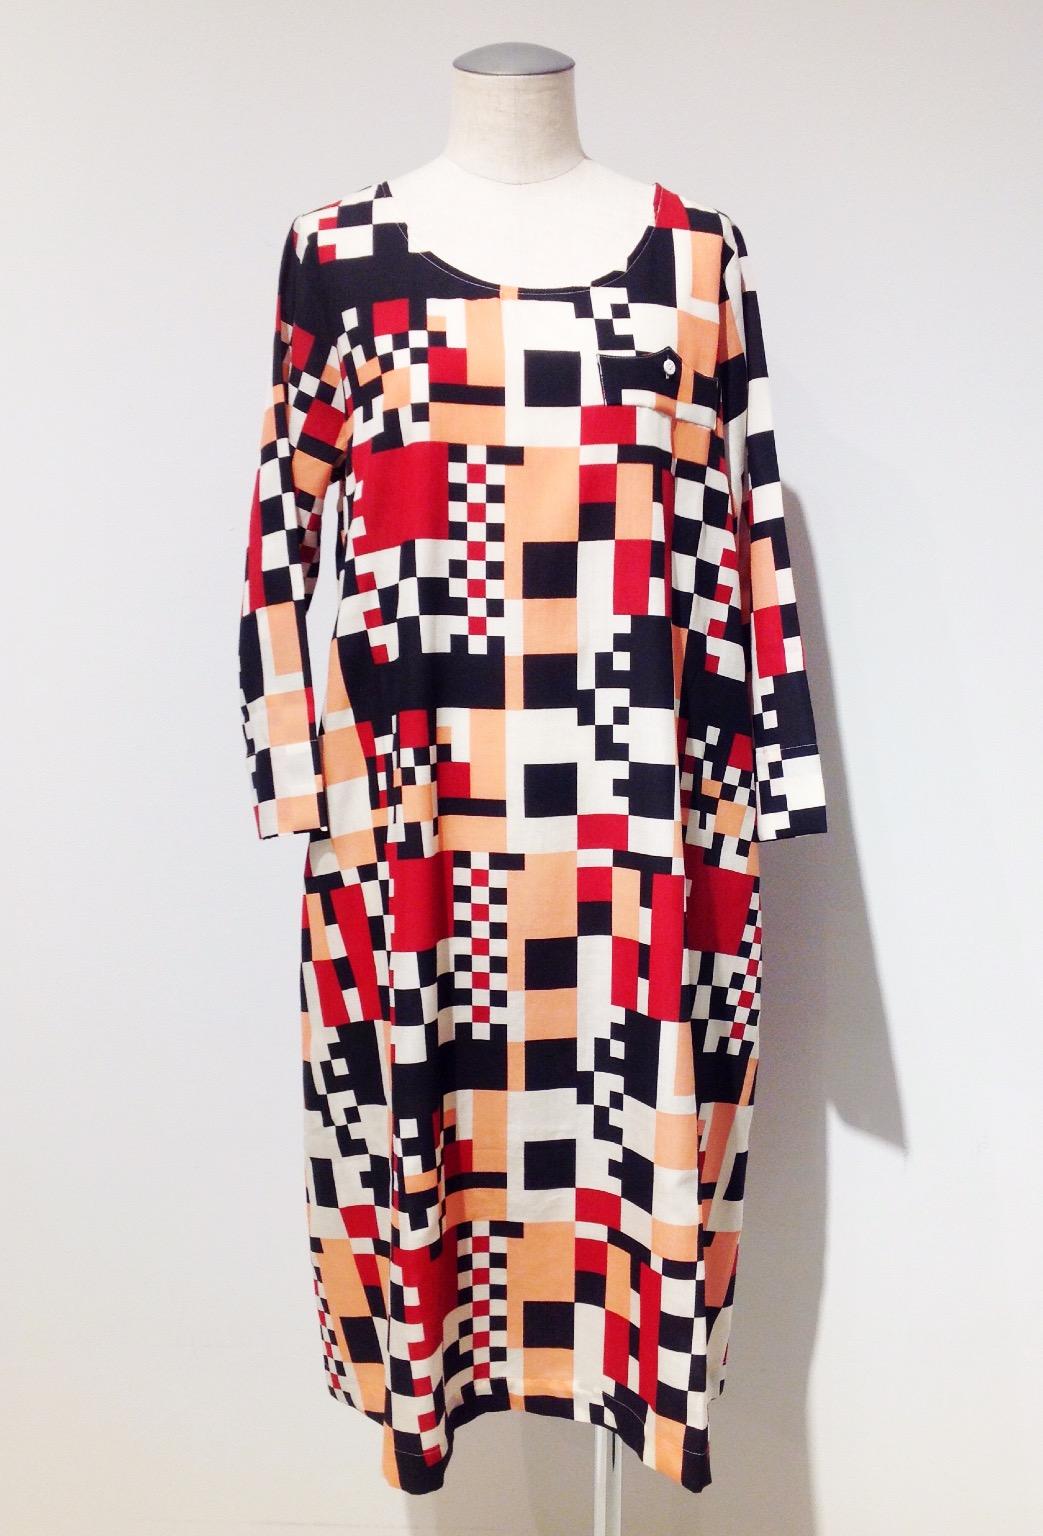 mintdesigns【ミントデザインズ】LEGO PRINT DRESS◆香川・綾川店